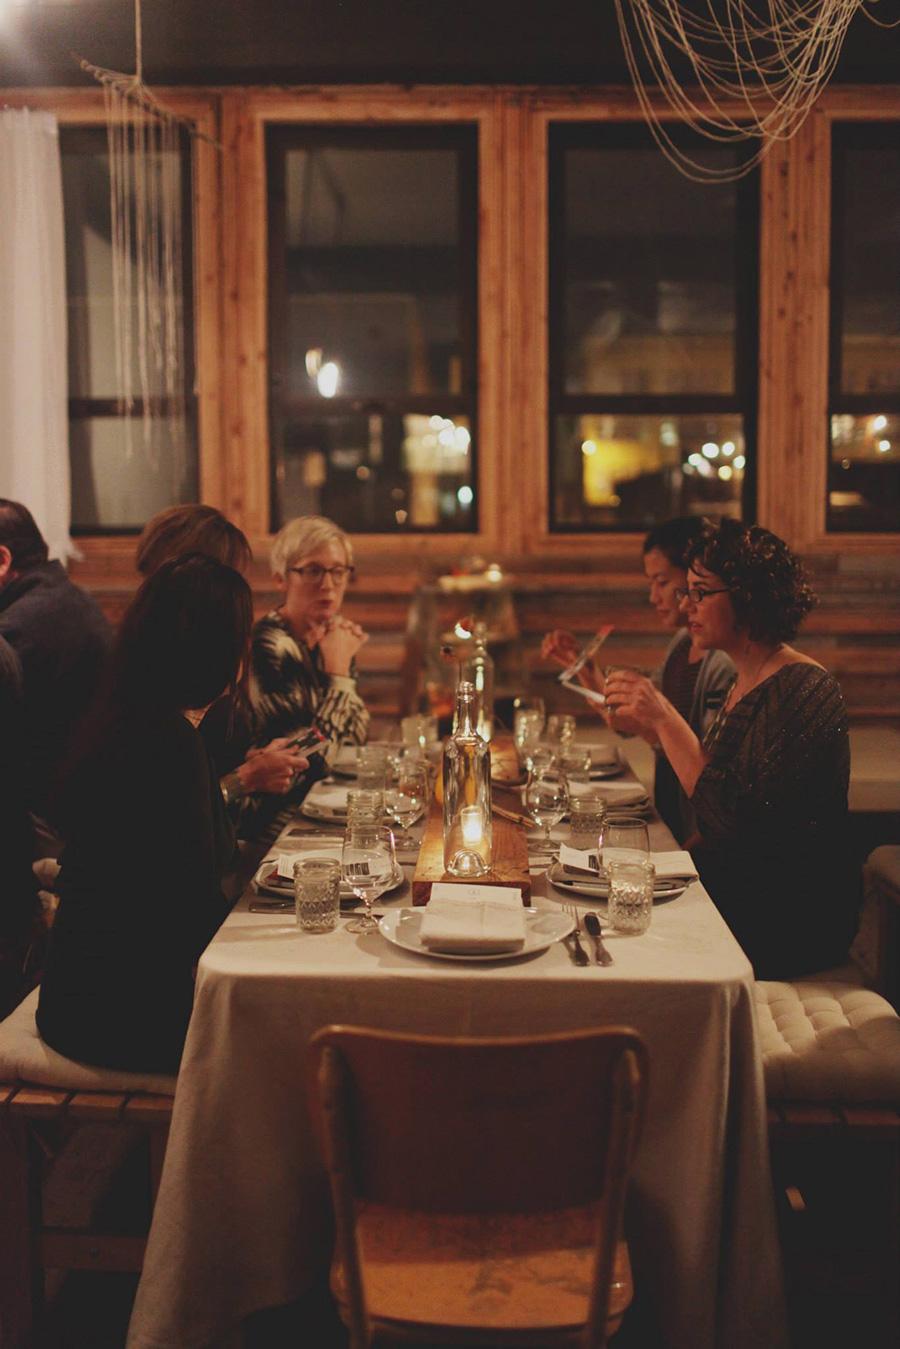 Association-Portland-dinner-series-4.jpg